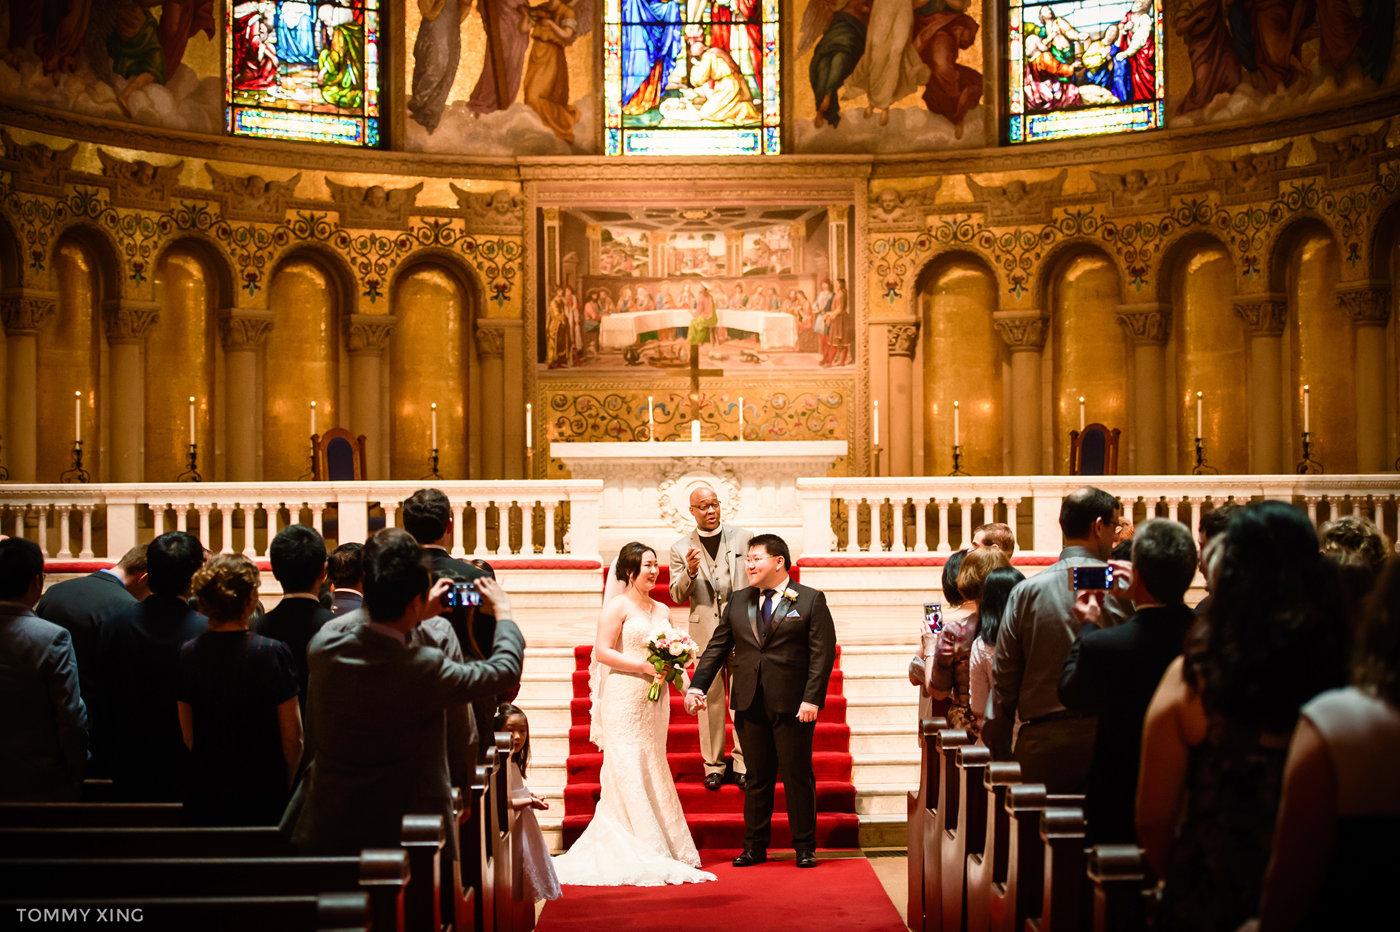 STANFORD MEMORIAL CHURCH WEDDING - Wenjie & Chengcheng - SAN FRANCISCO BAY AREA 斯坦福教堂婚礼跟拍 - 洛杉矶婚礼婚纱照摄影师 Tommy Xing Photography088.jpg